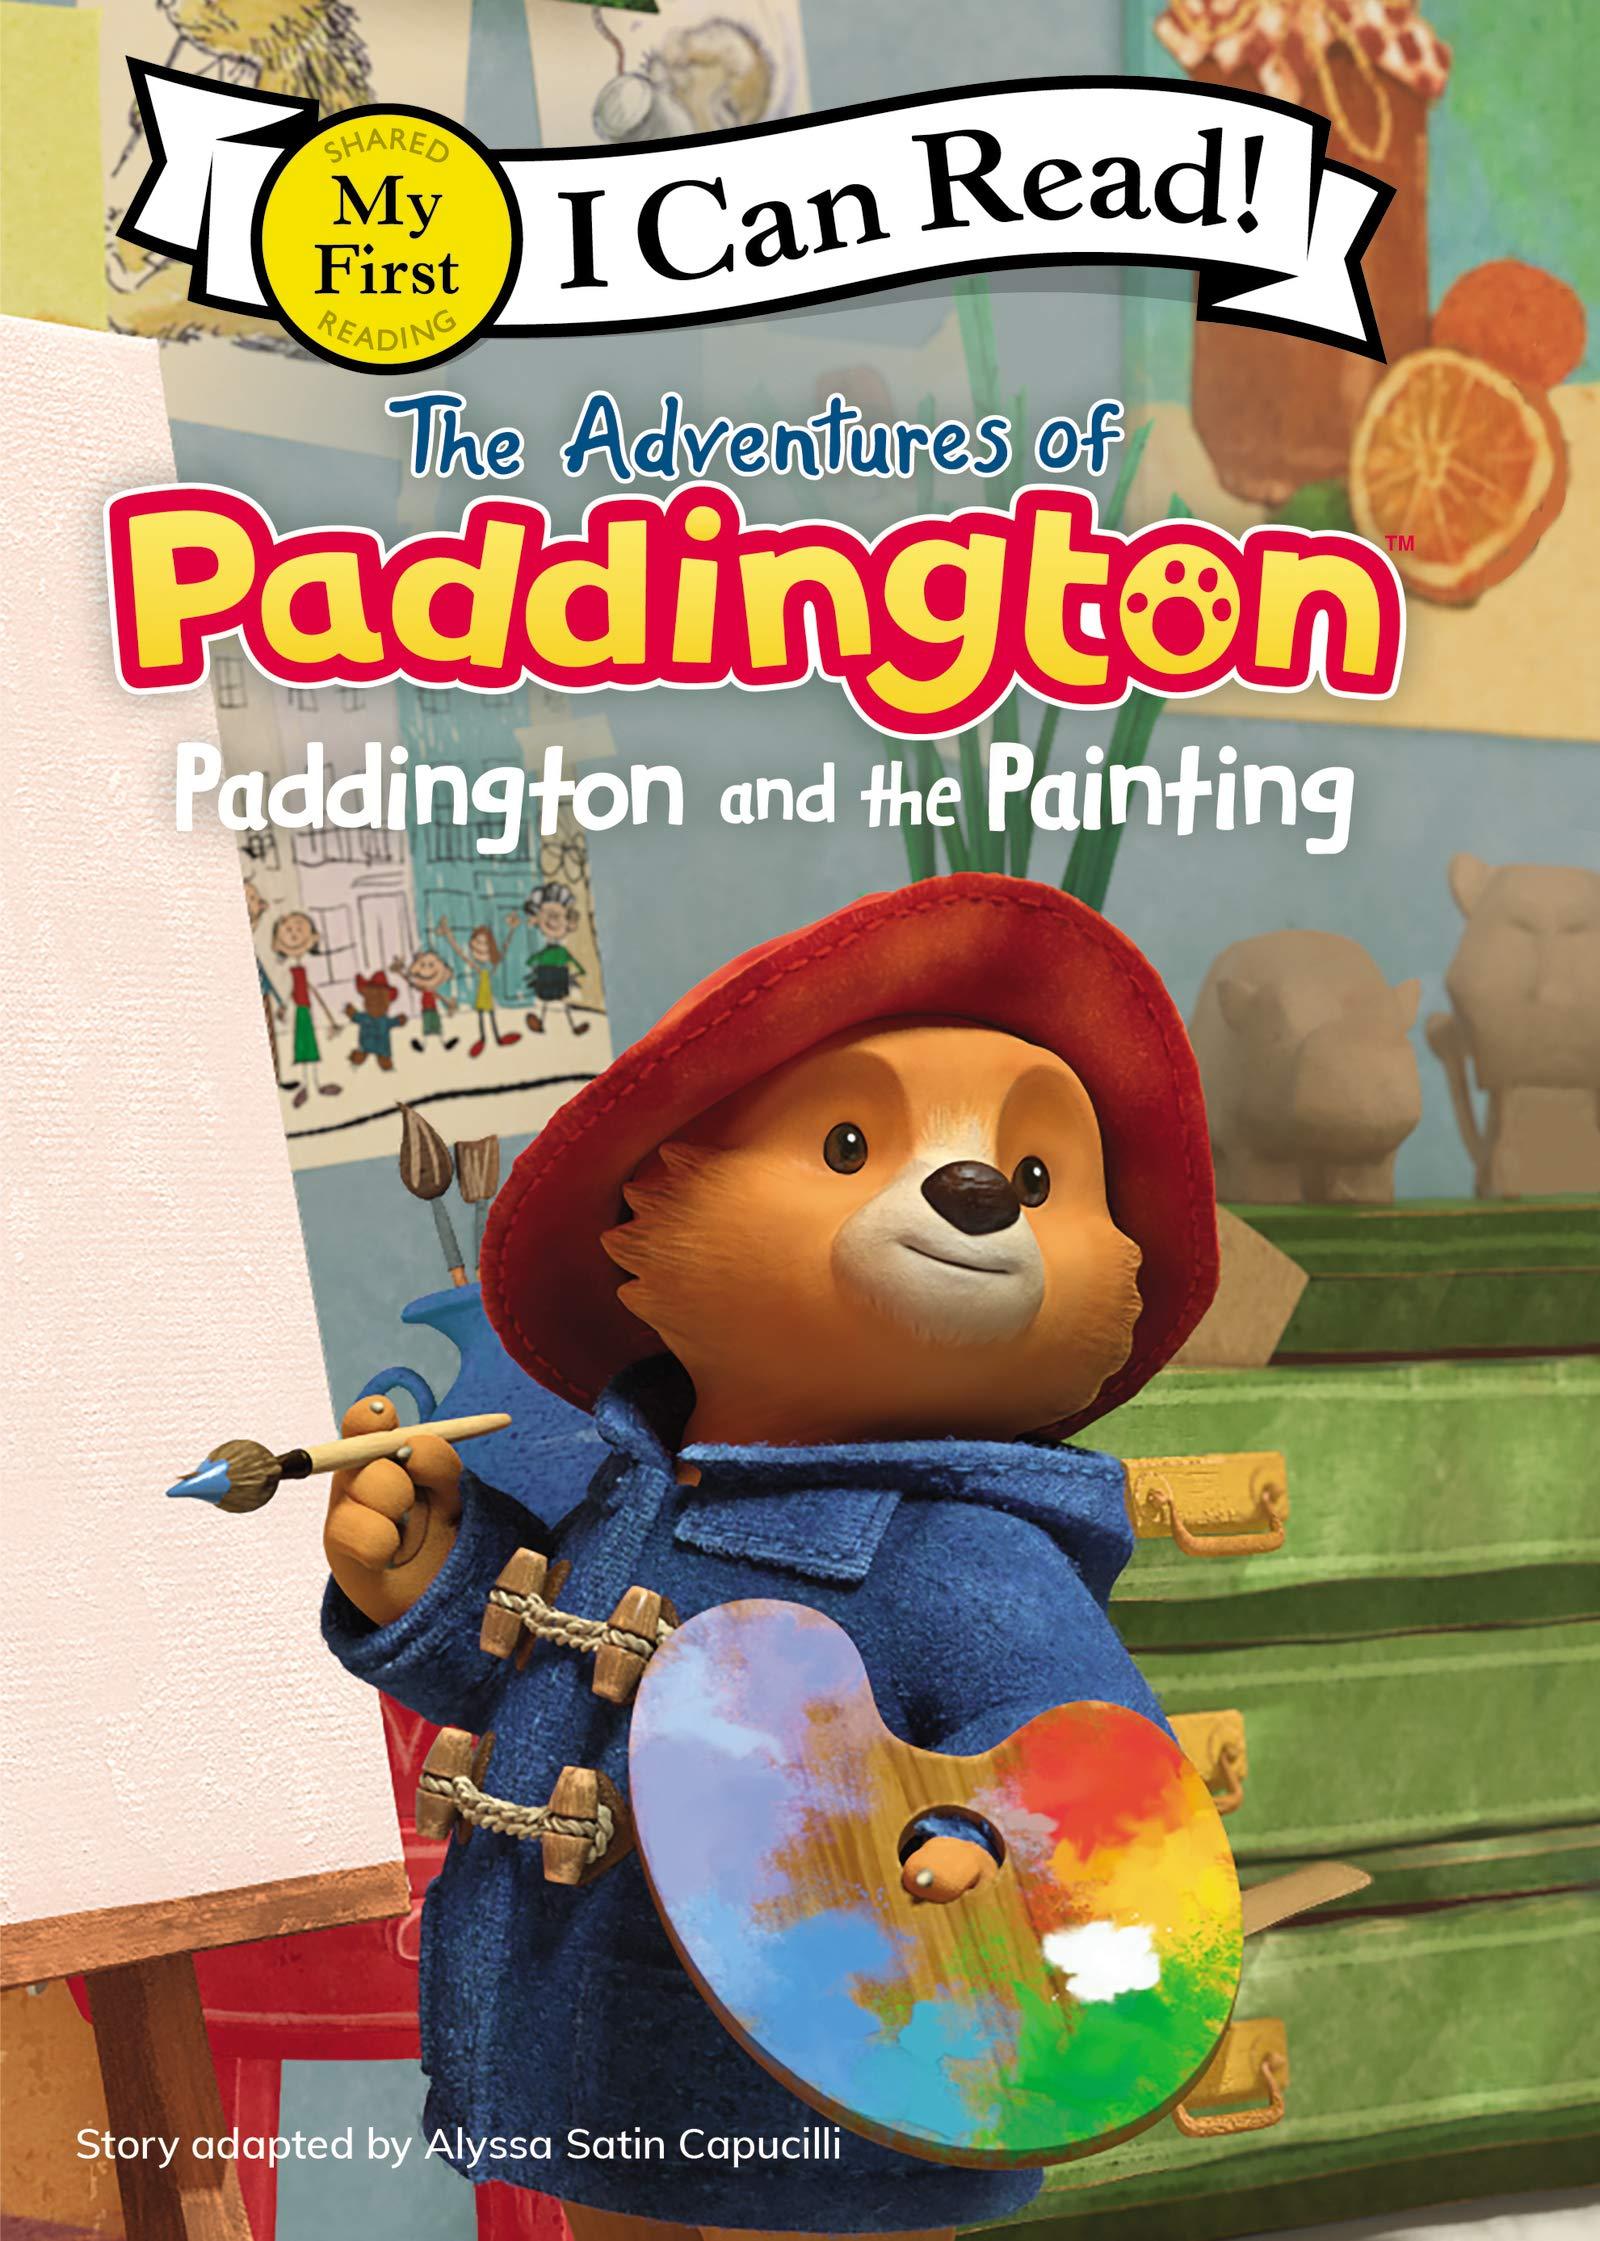 Paddington Traveling Adventures Quilt